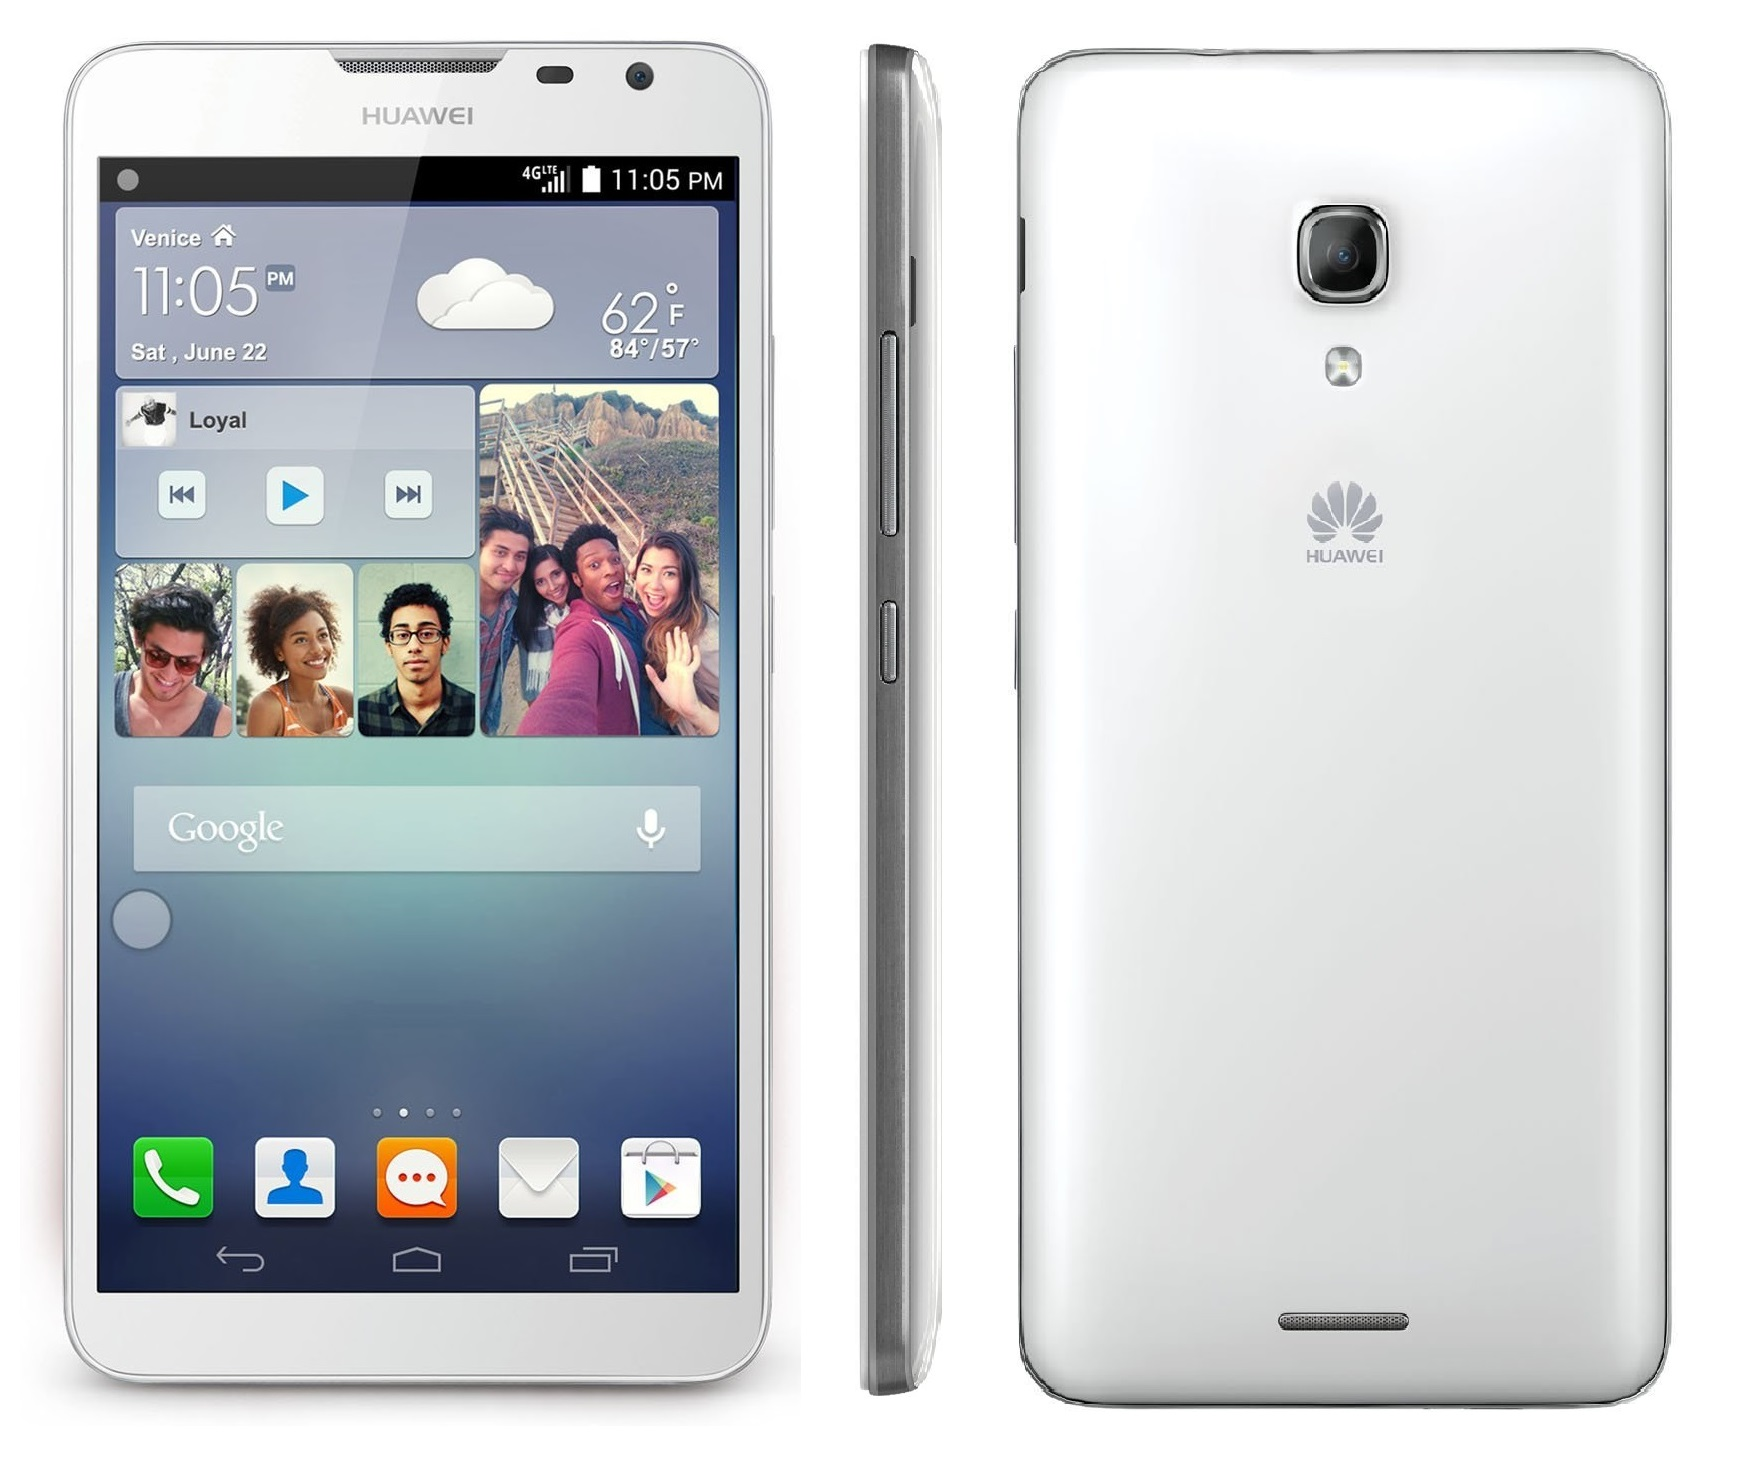 Huawei Ascend Mate 2 B850 Lollipop Firmware